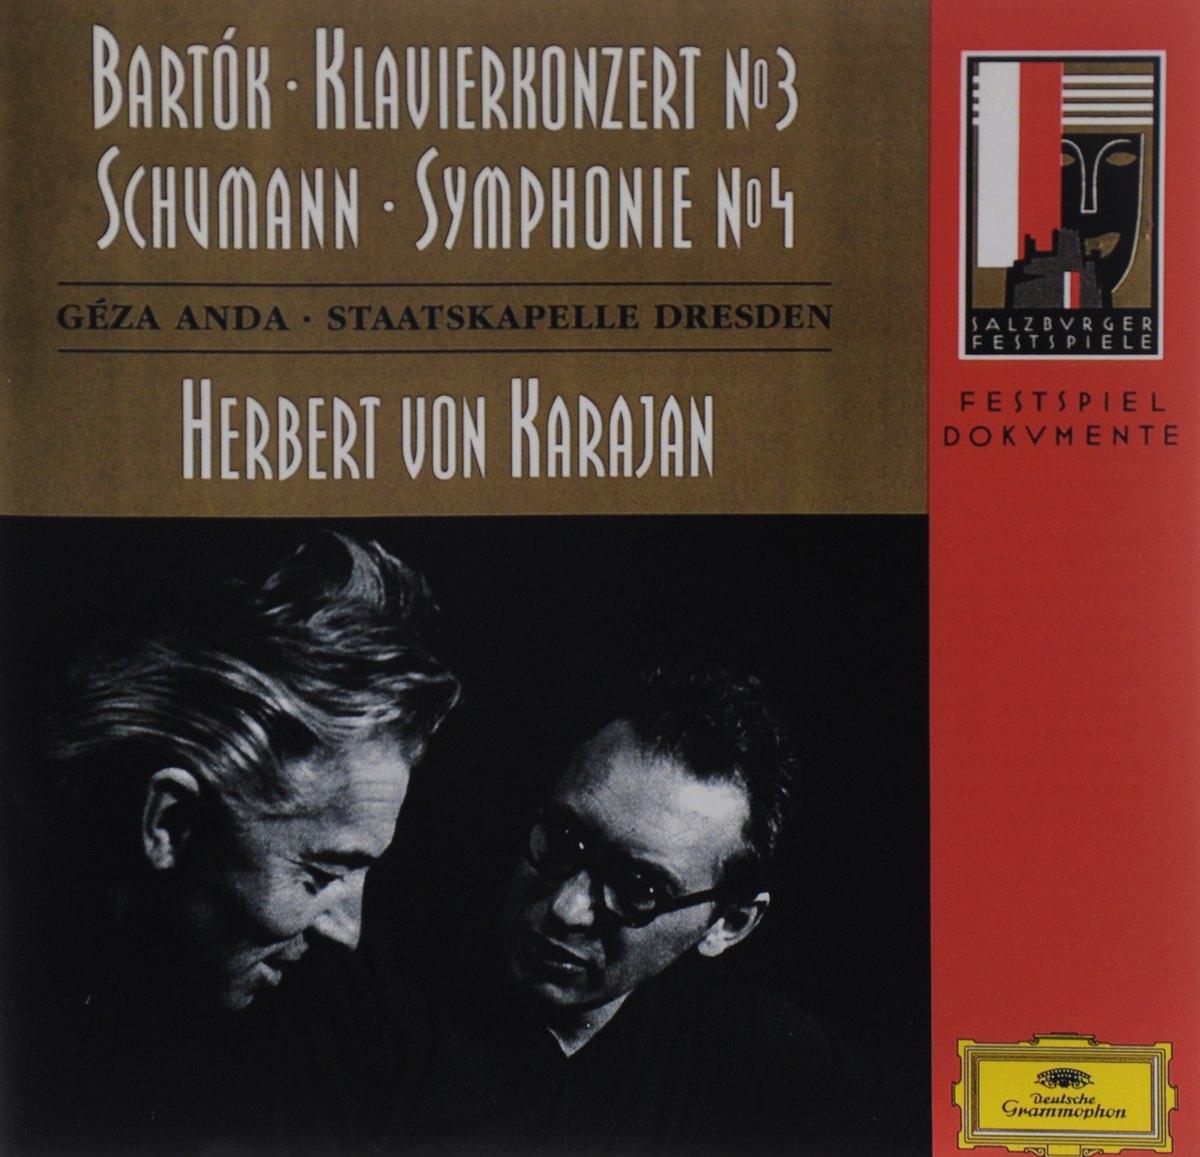 Геза Анда,Staatskapelle Dresden Herbert von Karajan. Bartok. Klavierkonzert №3 / Schumann. Symphonie №4